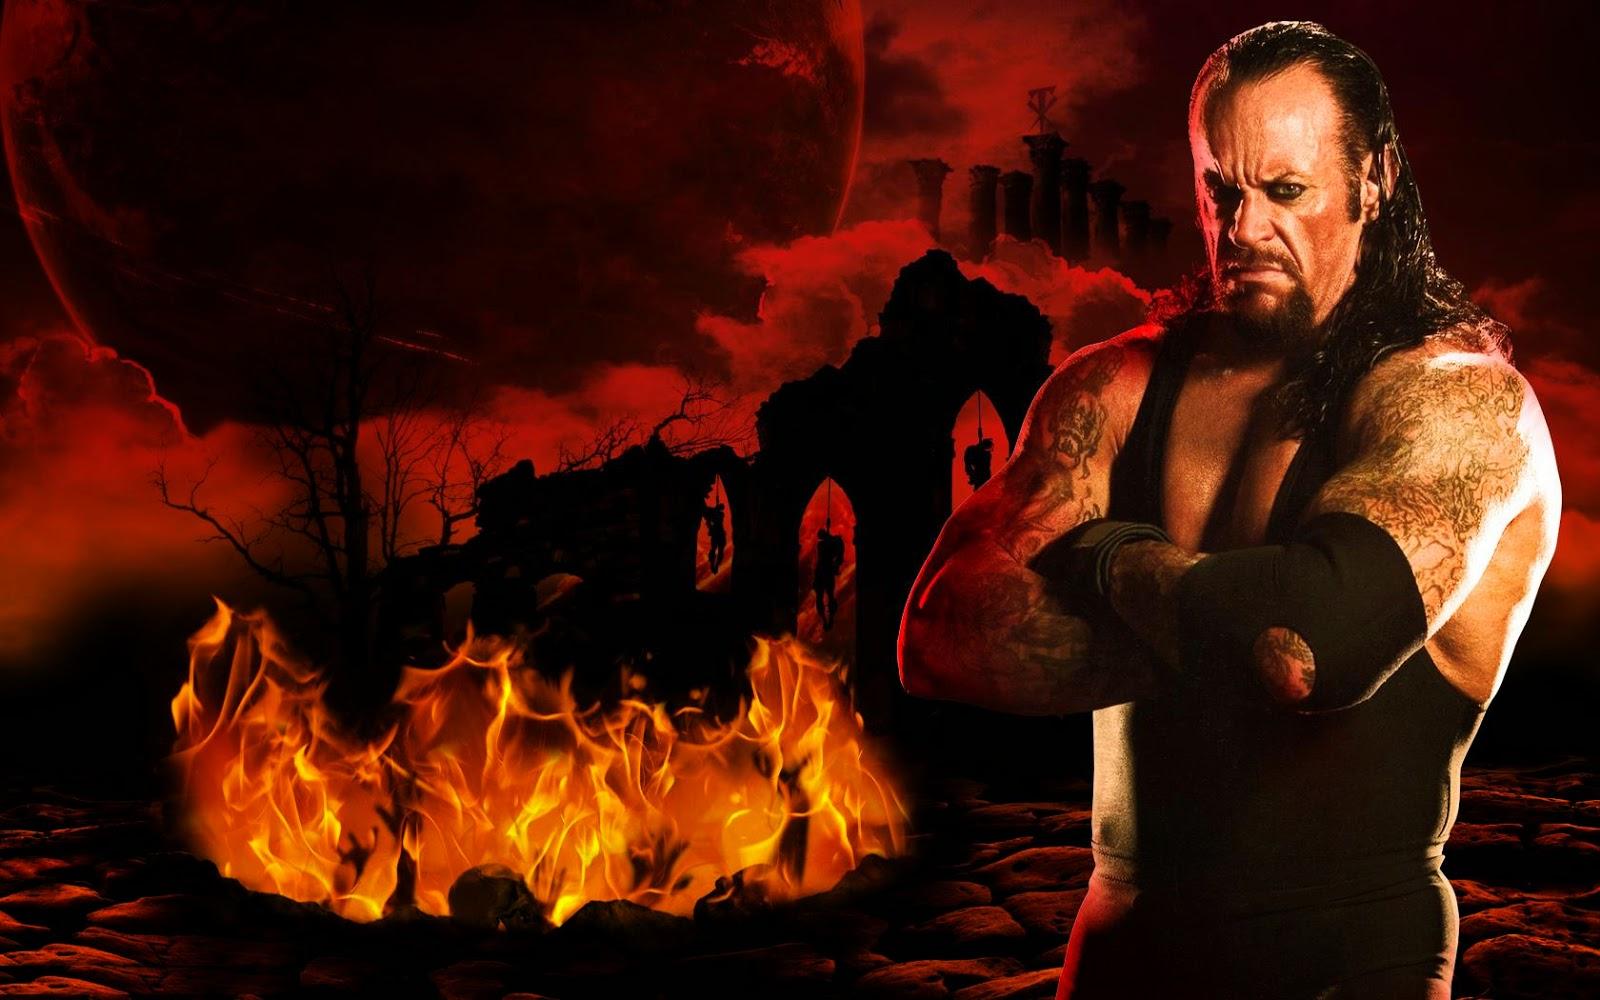 Brock Lesnar Hd Wallpaper Undertaker Hd Wallpapers Free Download Wwe Hd Wallpaper